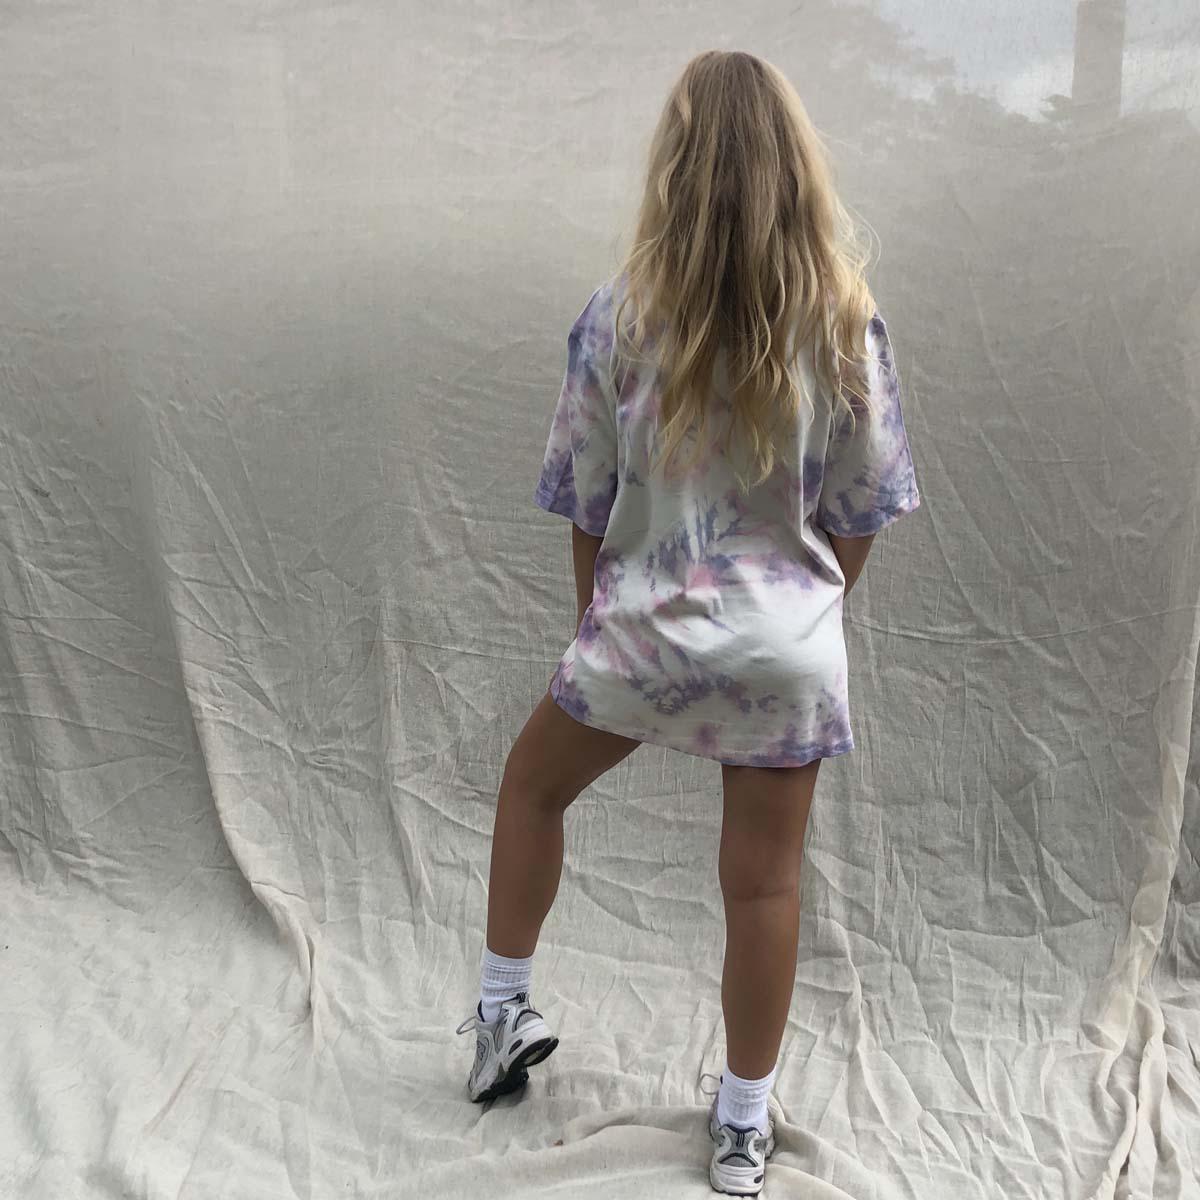 IMG 8135 - Candy Oversized T-shirt Dress